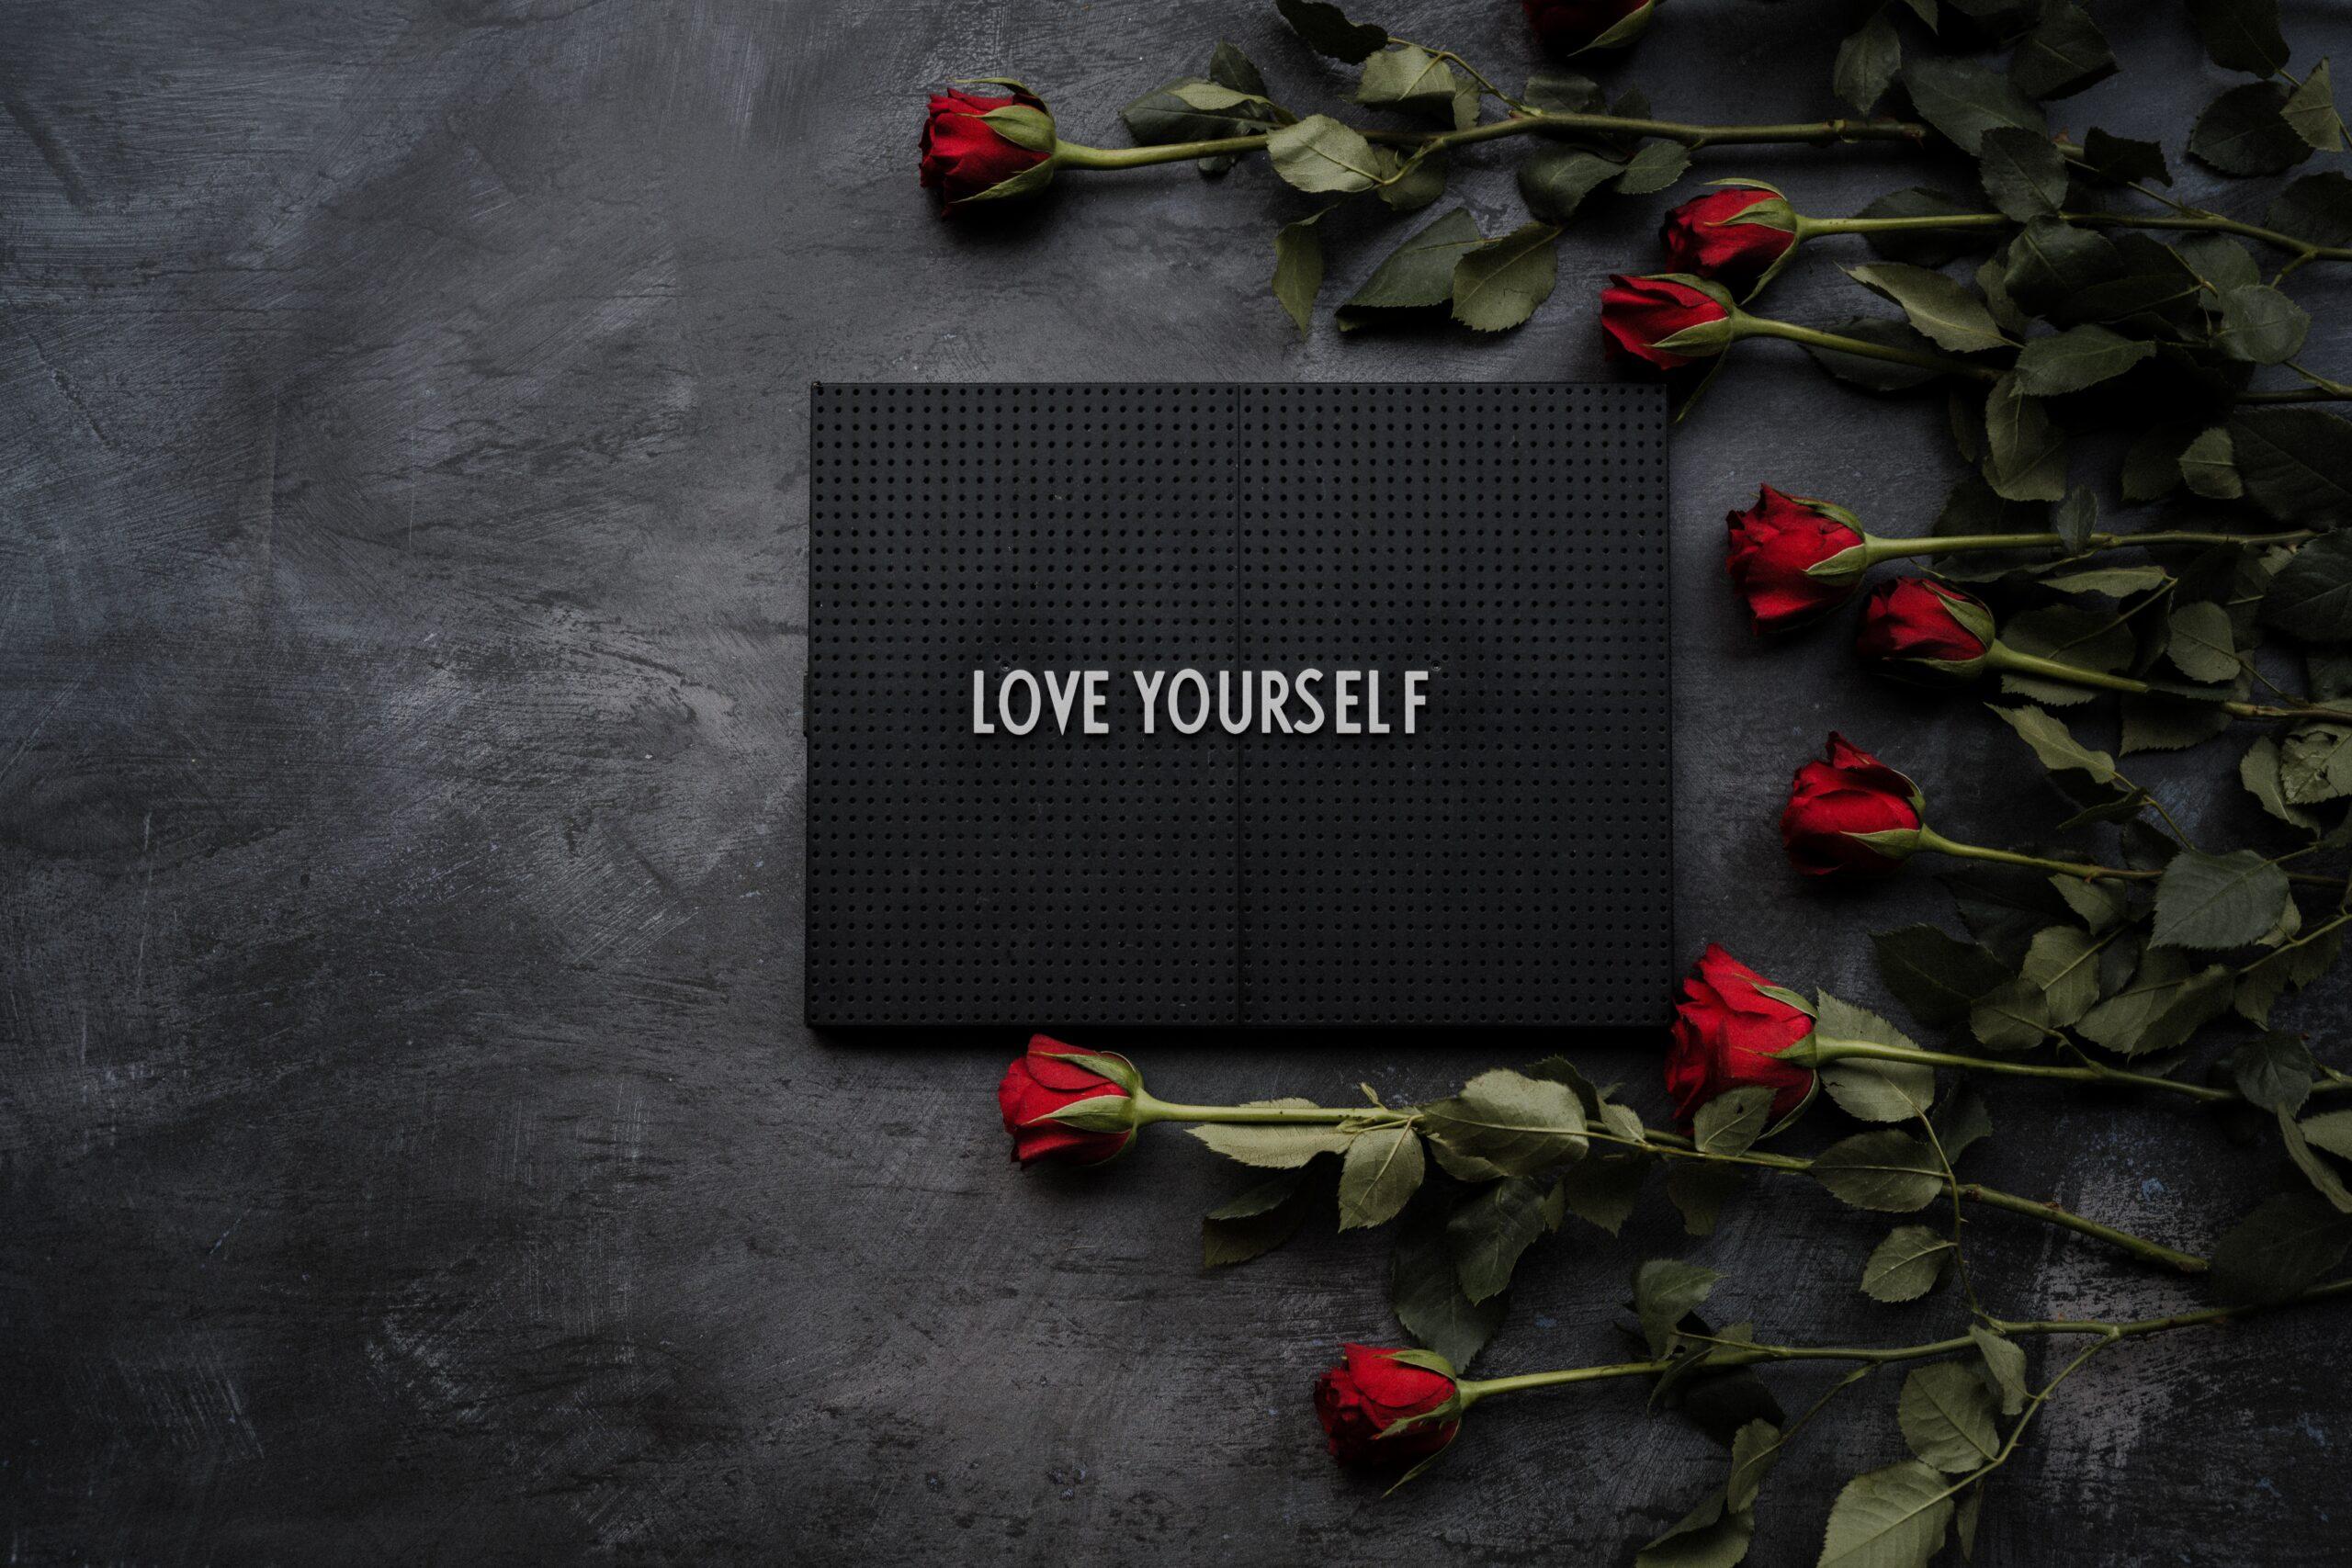 SELF-LOVE – A Journey Inward